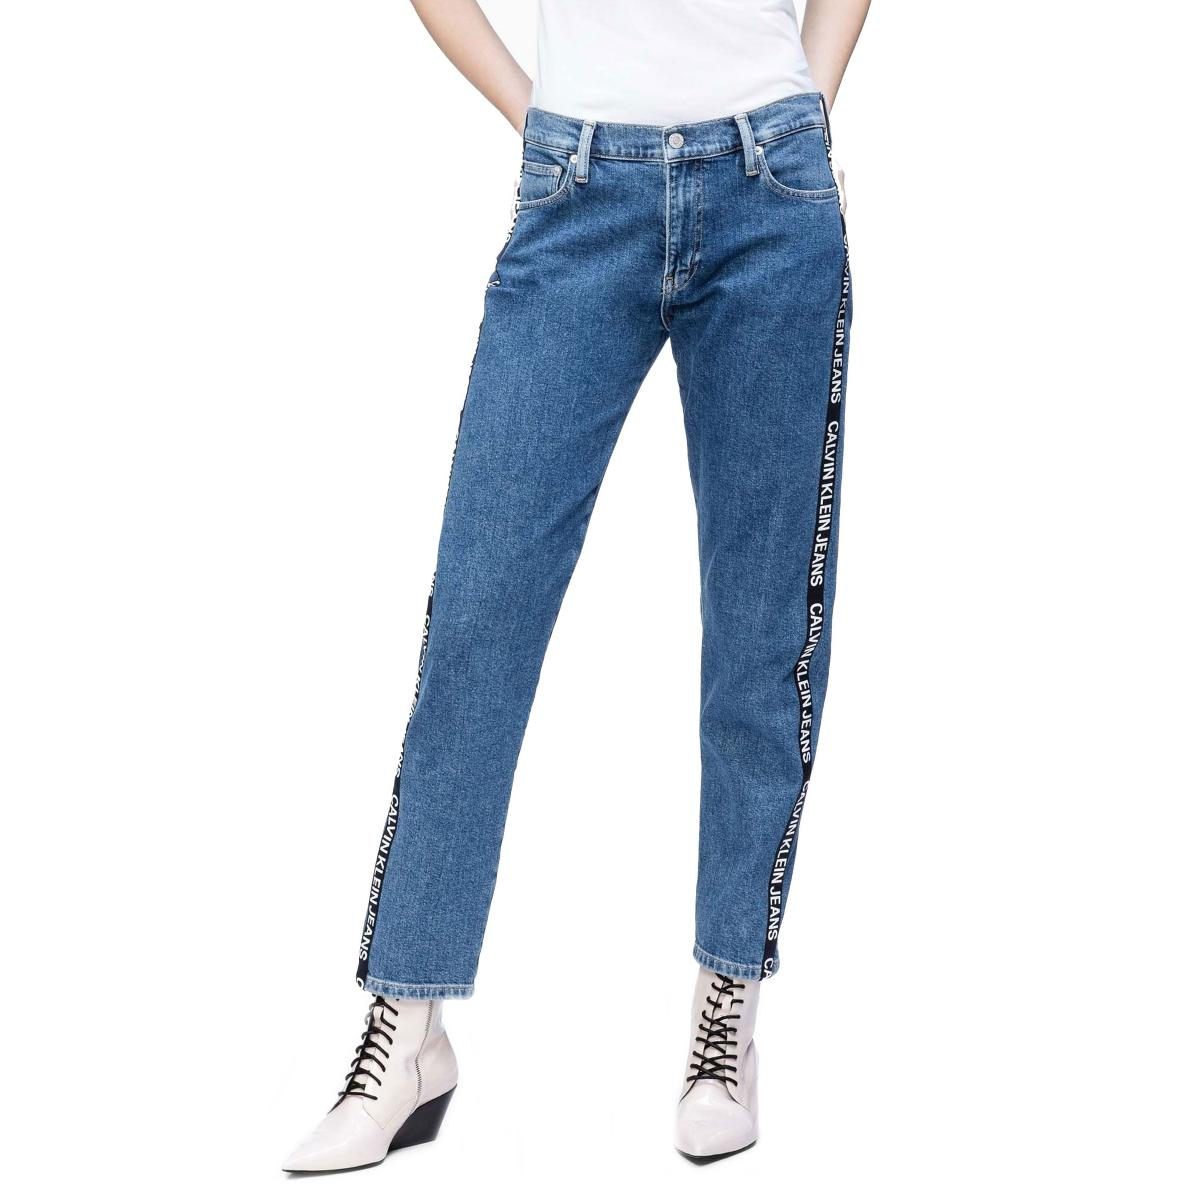 Jeans Calvin Klein Jeans con bande laterali con logo da donna rif. J20J211798